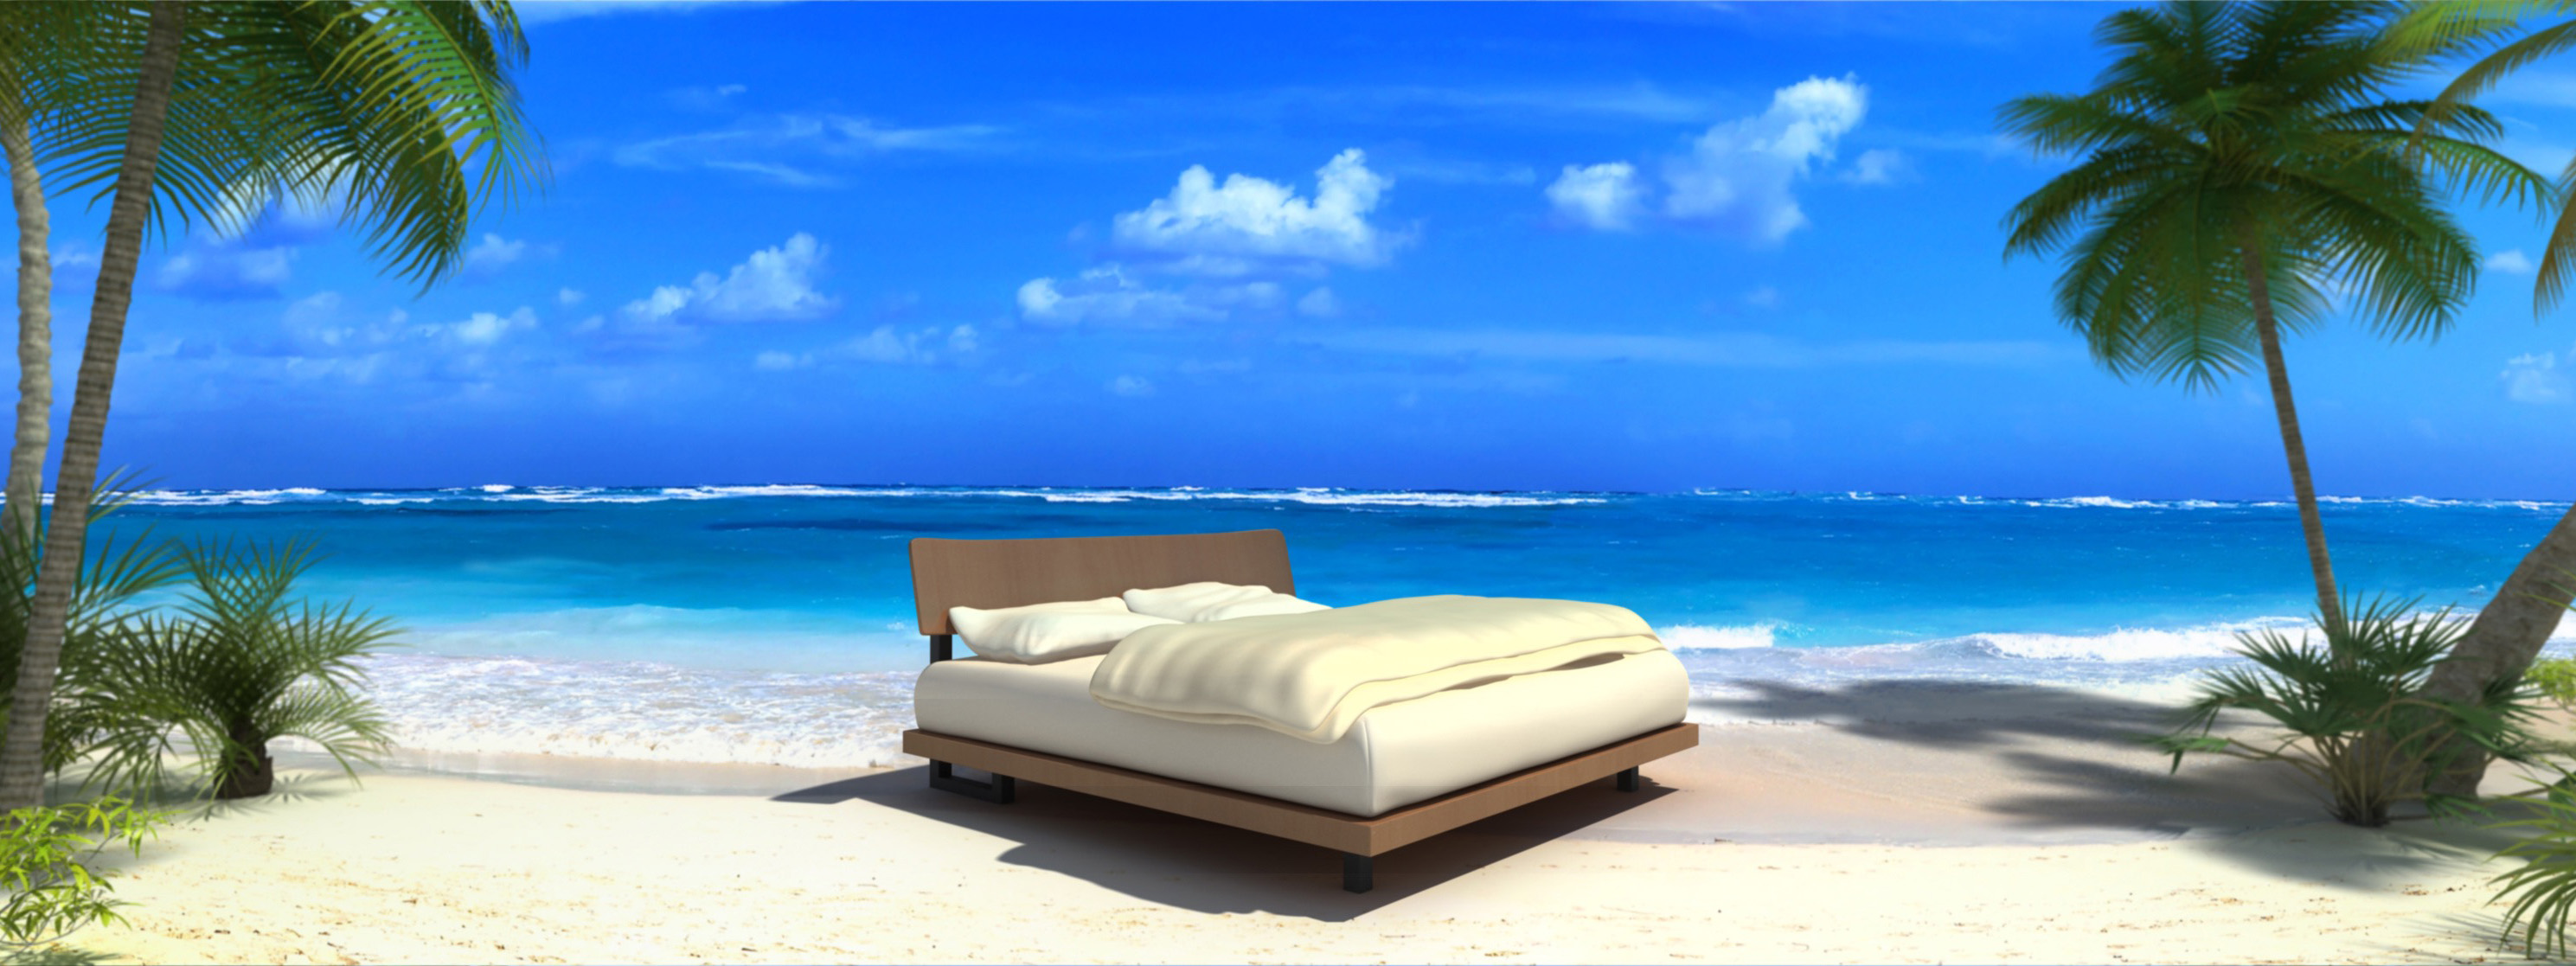 HP Bett am Strand